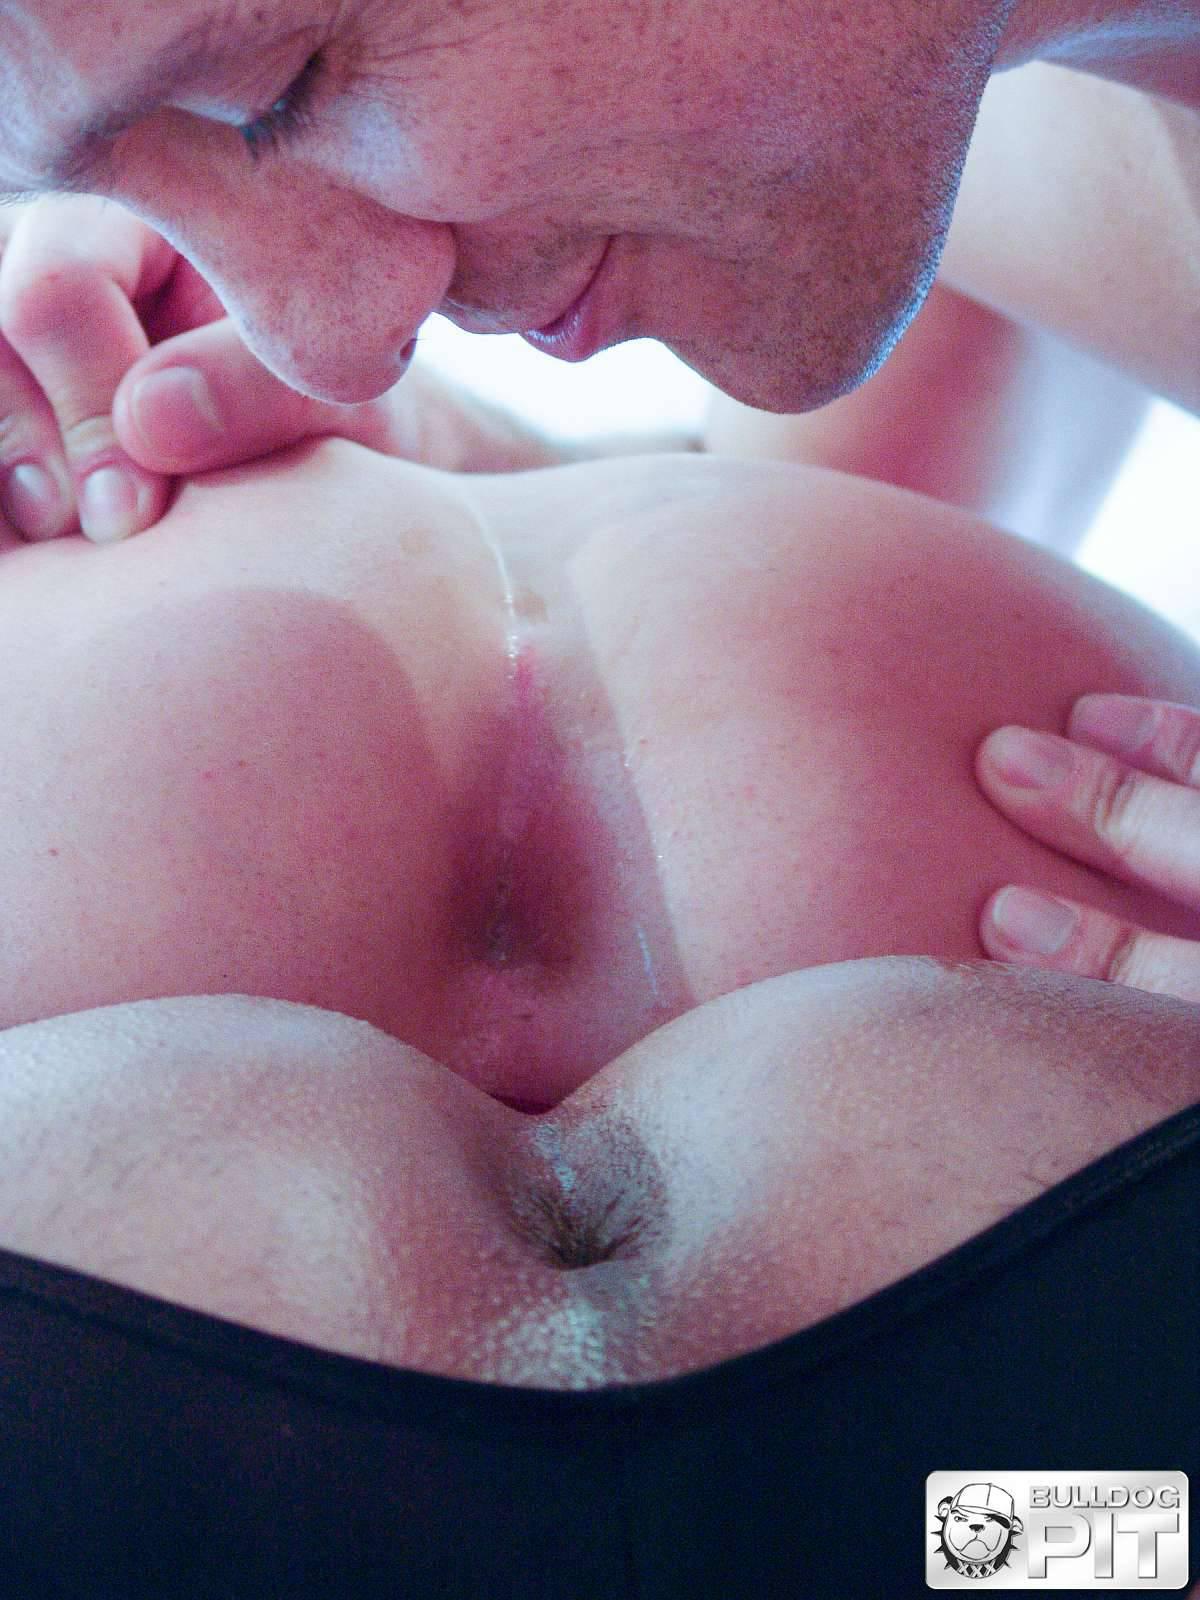 Deux gars costauds se sucent et baisent - Video Gay Muscles